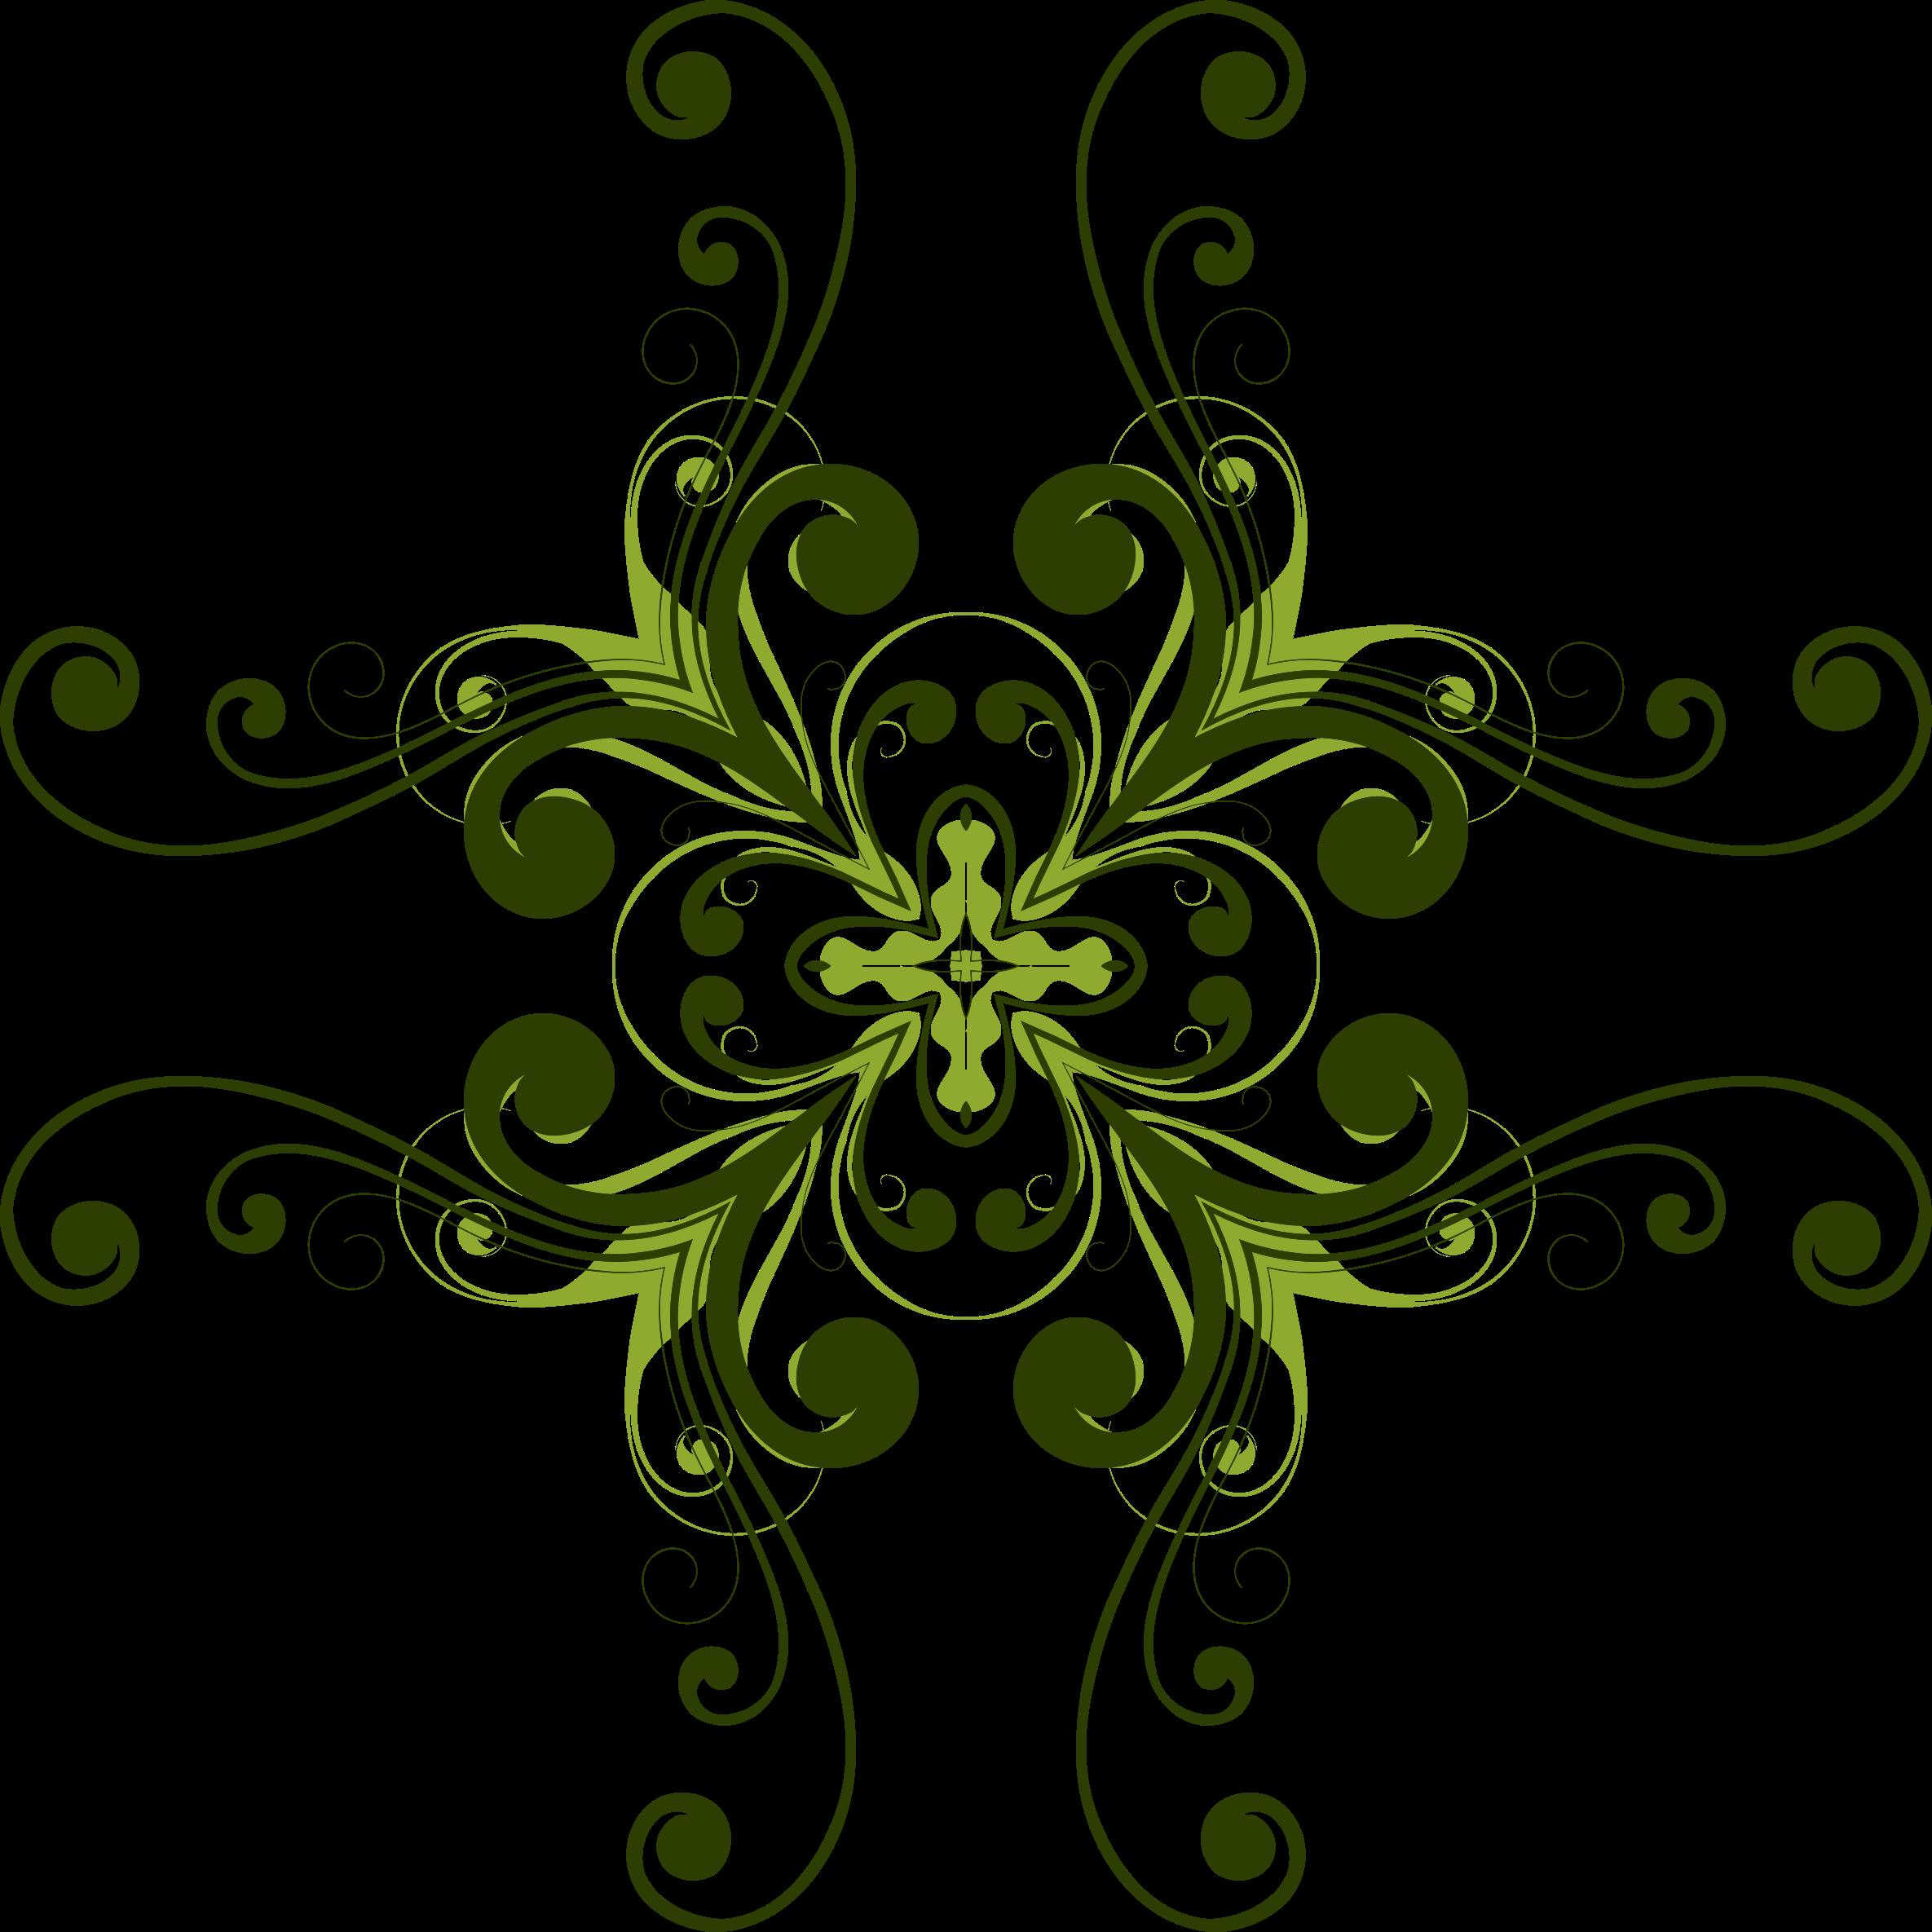 Clipart flower design freeuse Clipart - Flourish Flower Design 2 freeuse